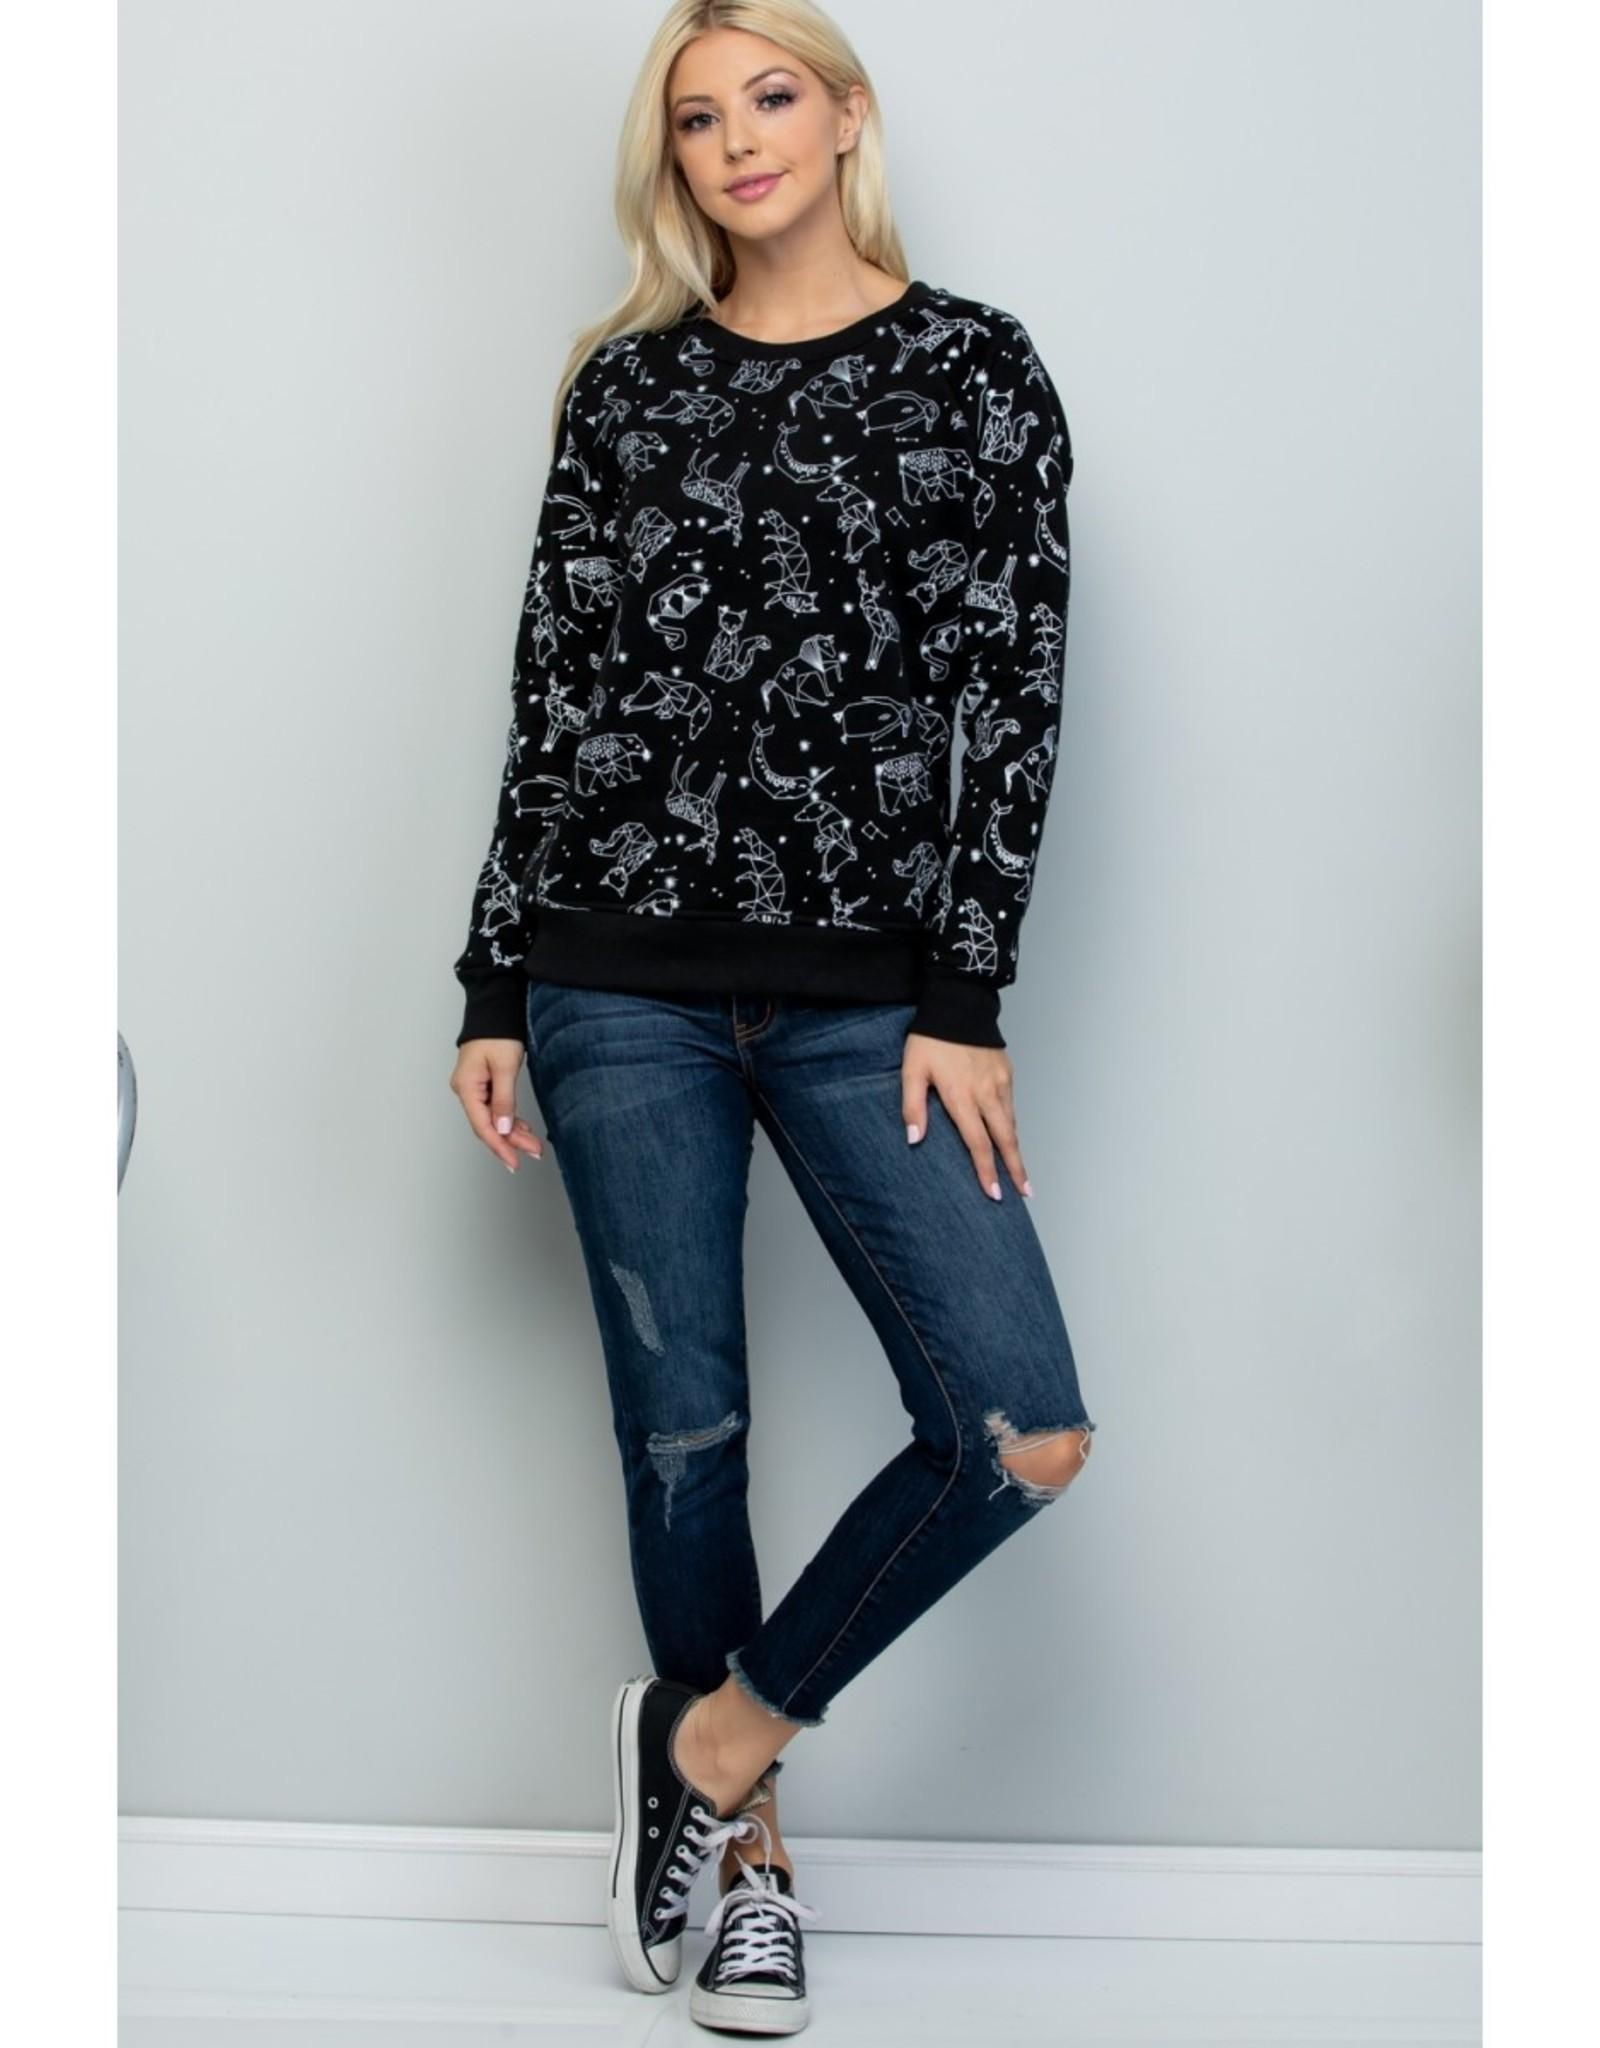 Celestial Animal Print Sweatshirt